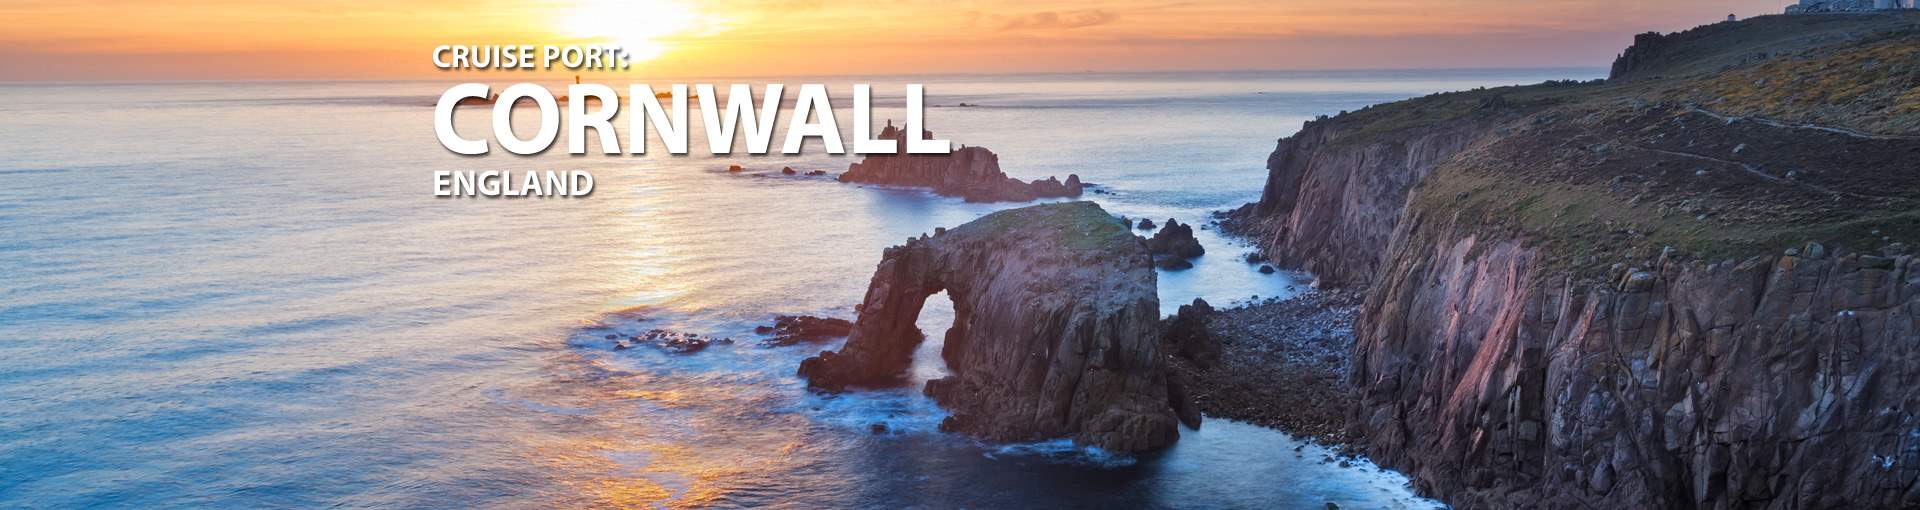 Cruises to Cornwall, England